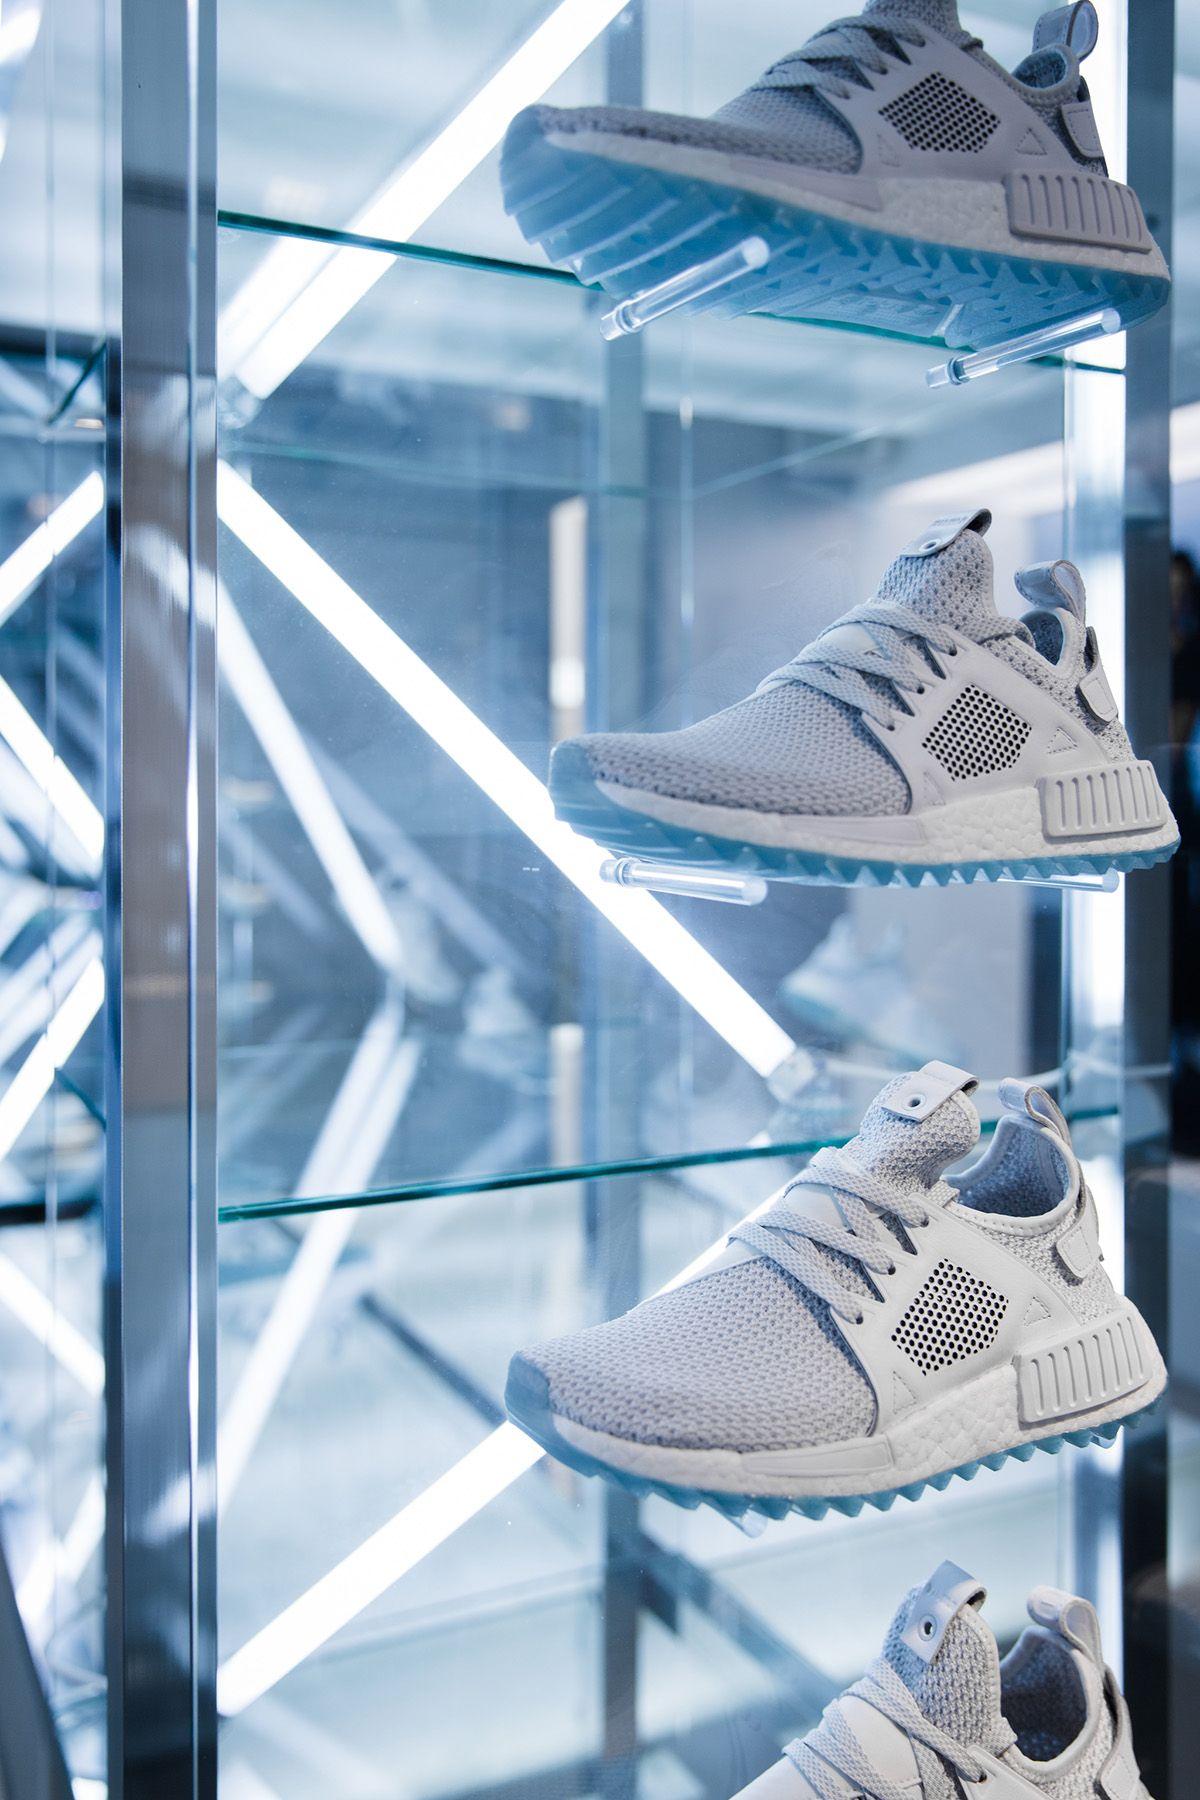 best service fa990 e9f38 Pop-Up Shop  Titolo x adidas Consortium NMD XR1 Trail Primeknit  Celestial   - EU Kicks  Sneaker Magazine